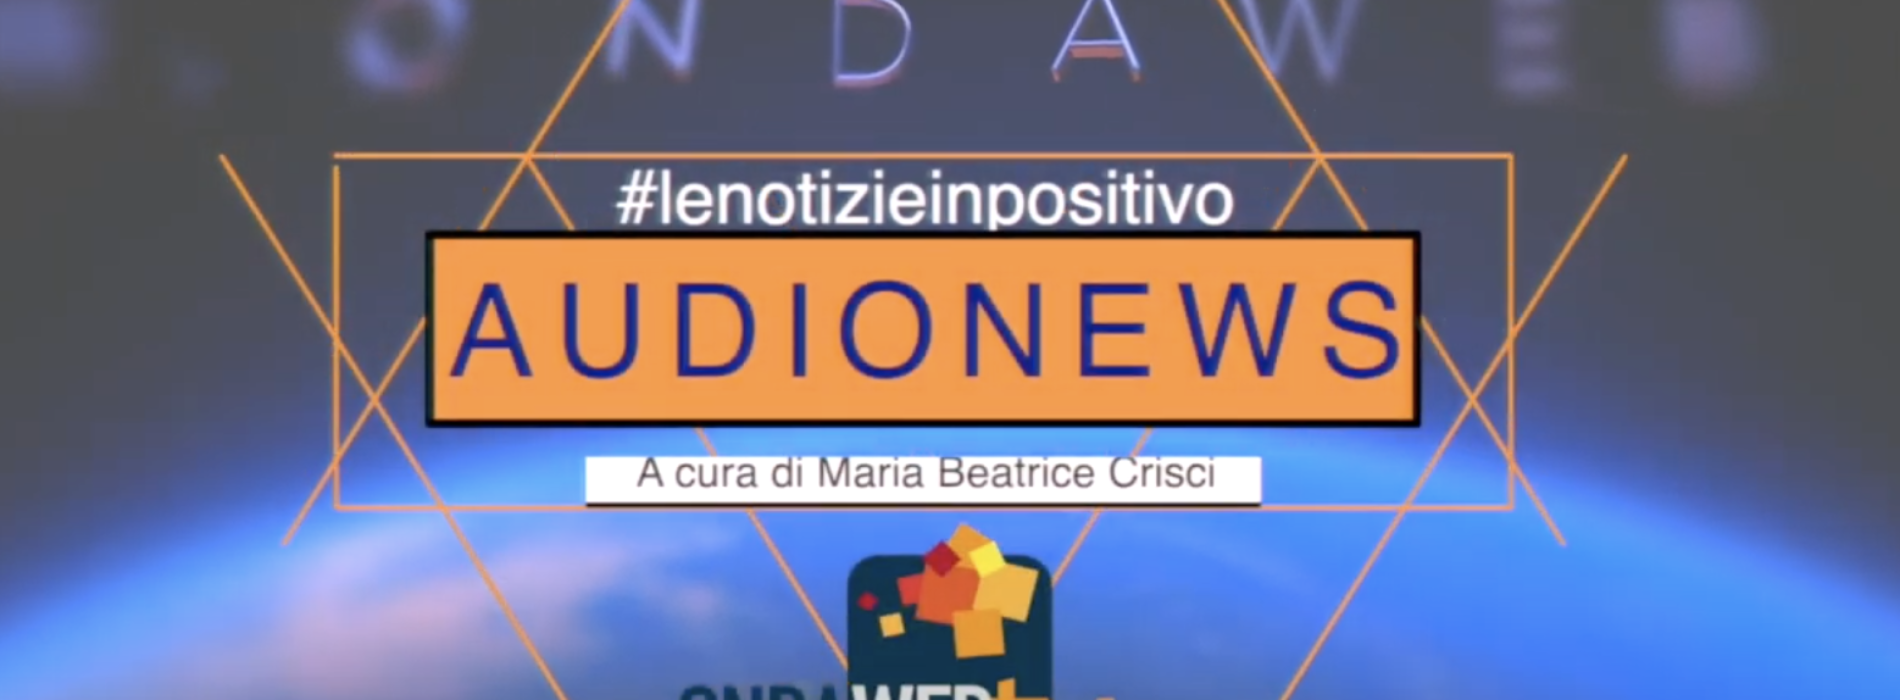 Audionews di Ondawebtv. 2 giugno